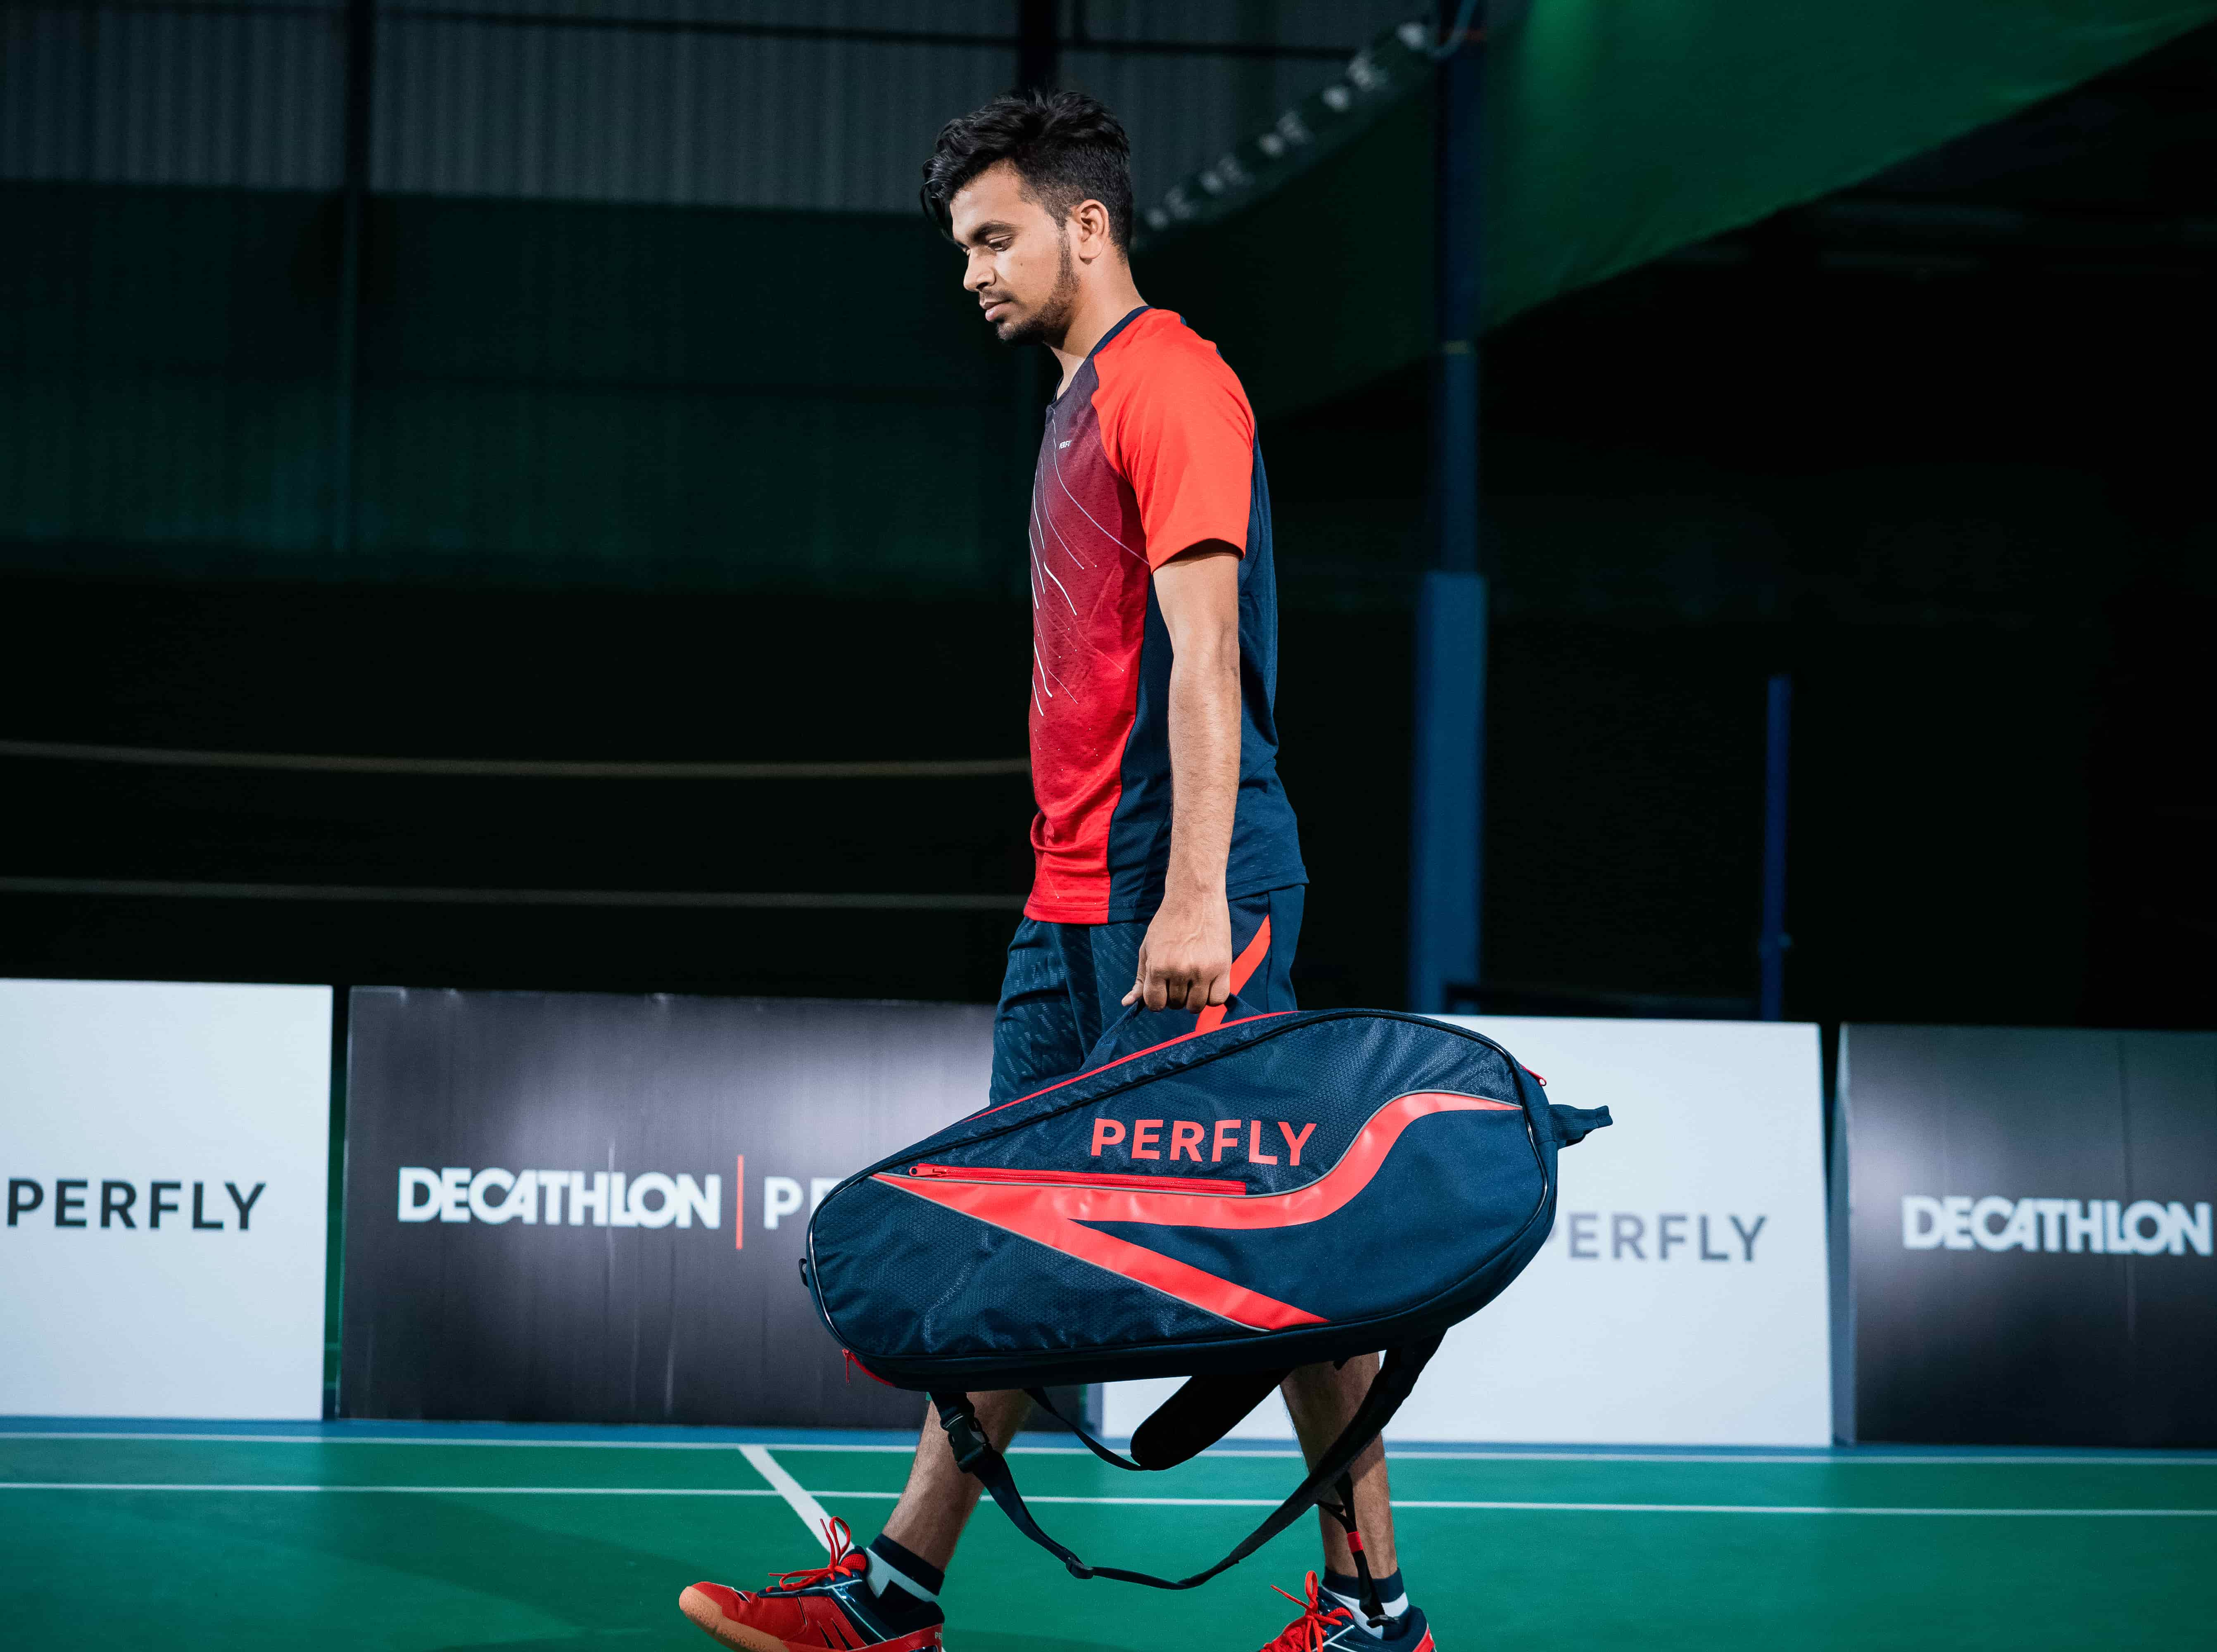 The Art of Organising Your Badminton Kit Bag